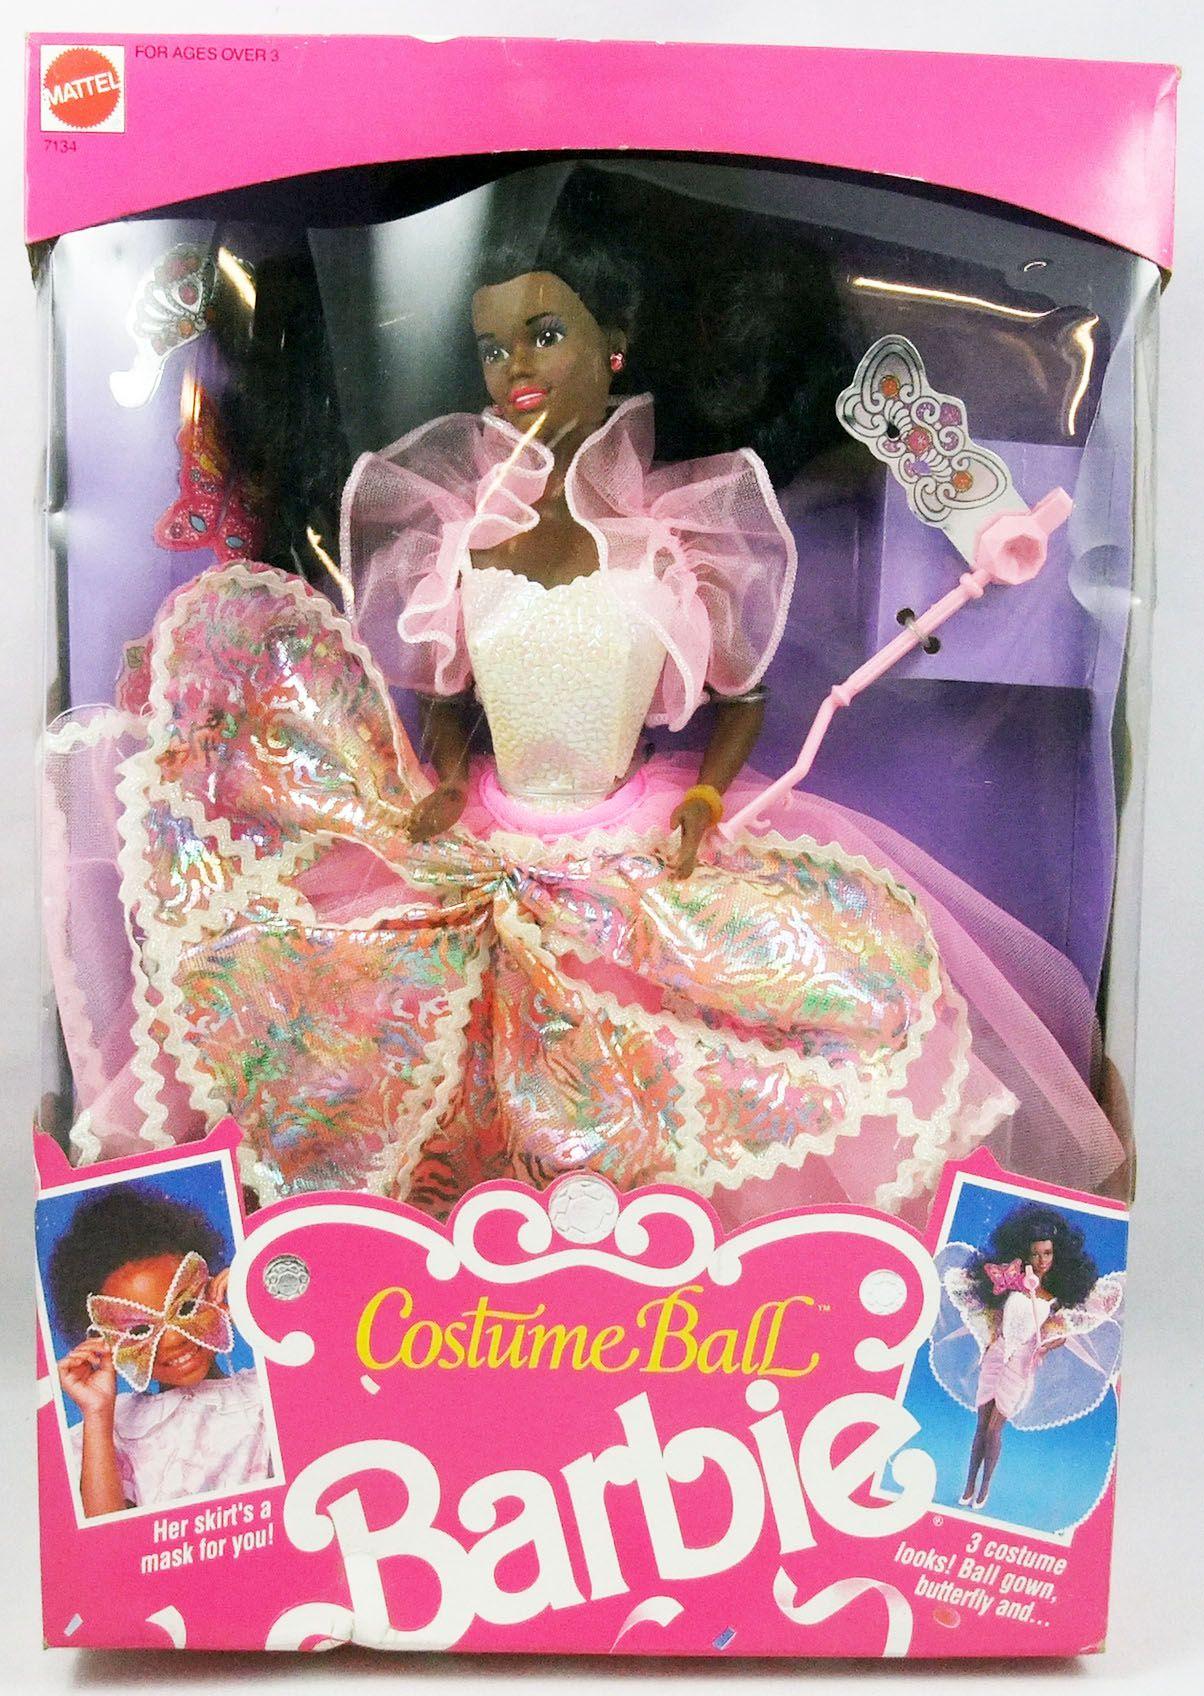 Barbie - Barbie (noire) Costume Ball Fantasy - Mattel 1990 (ref.7134)